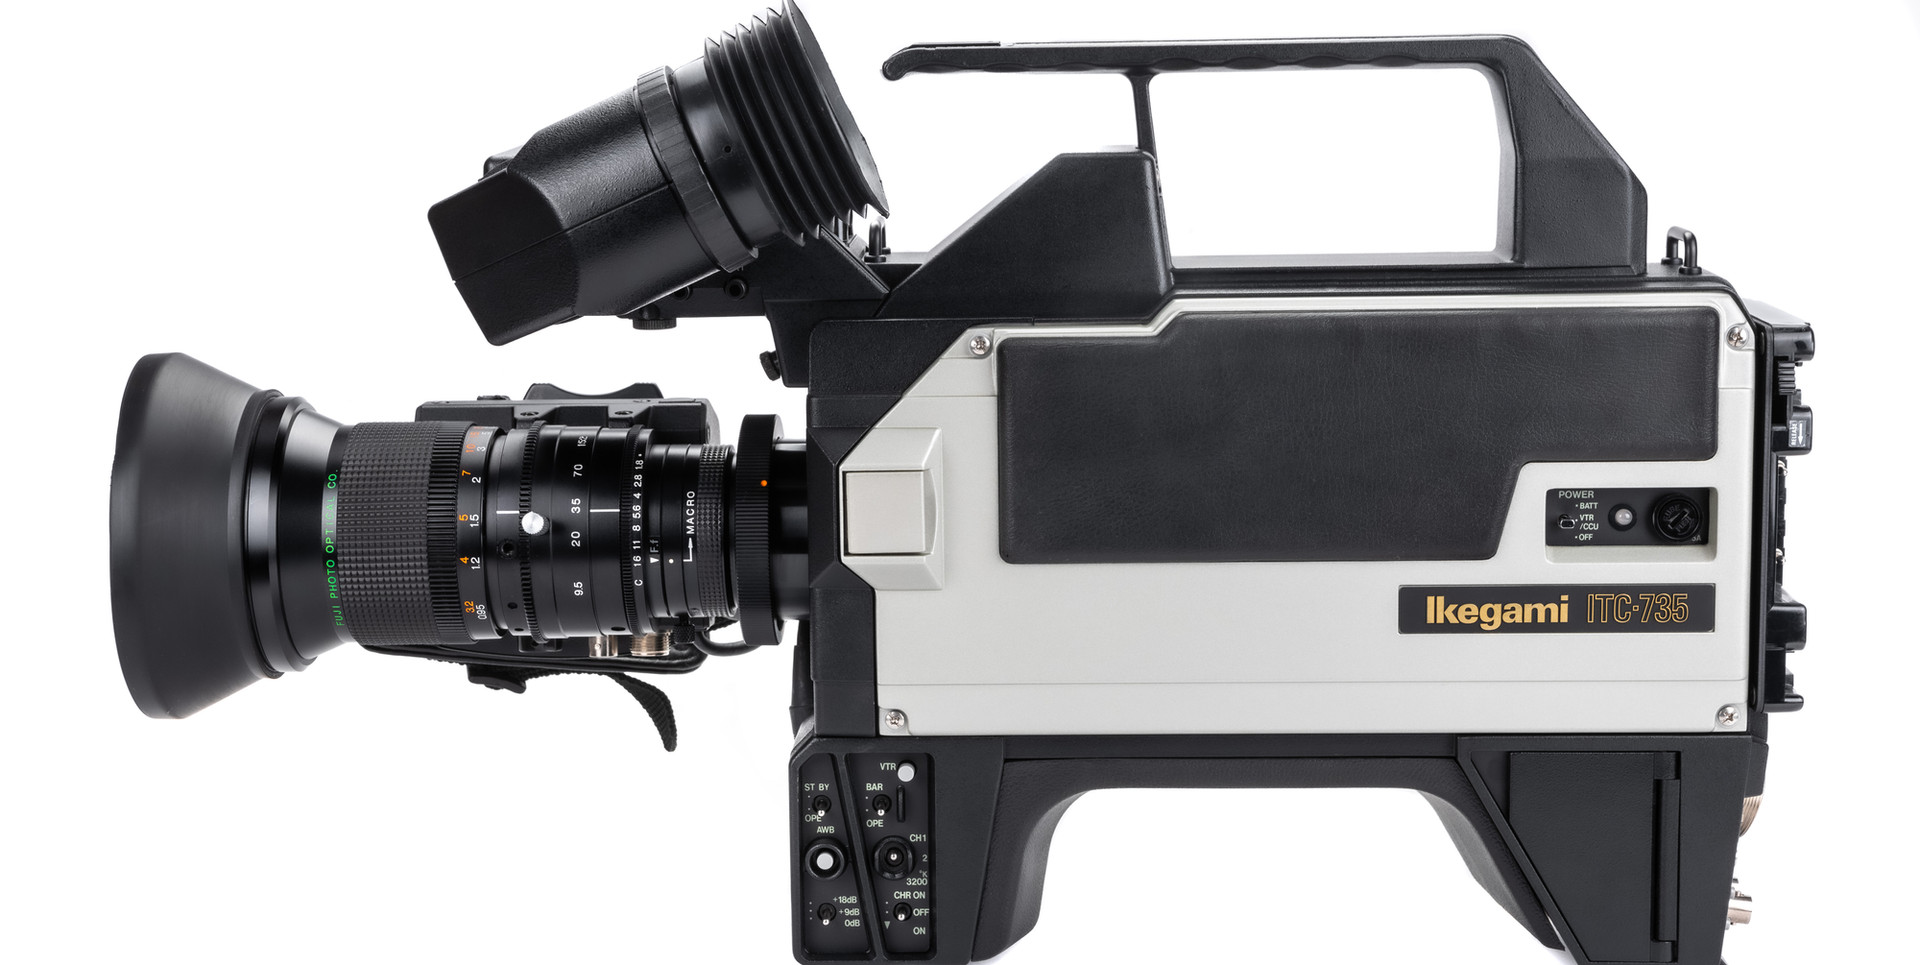 Ikegami ITC-735 - 6.jpg